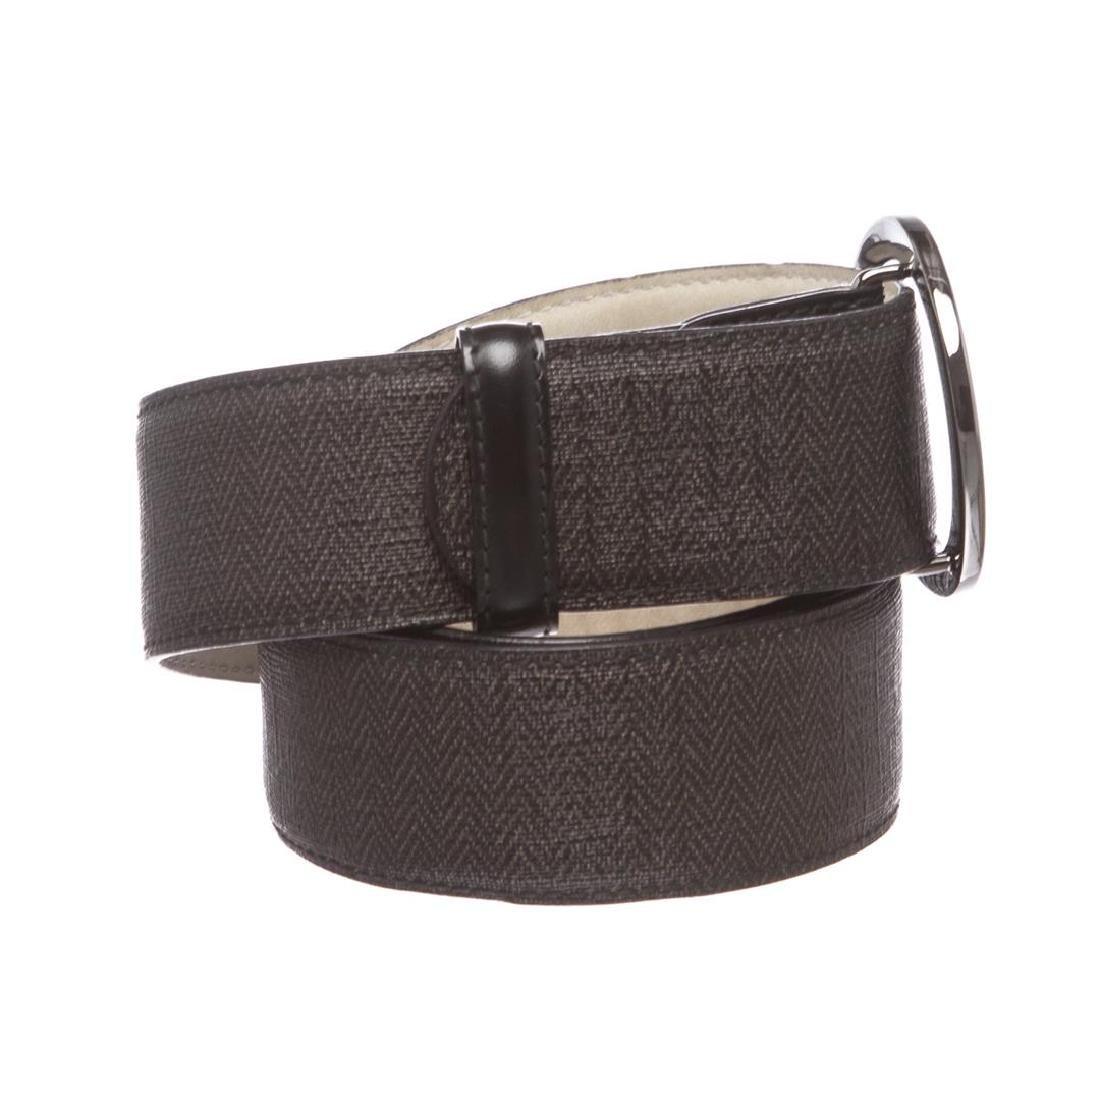 Bvlgari Black Gray Coated Canvas Leather Belt - 2